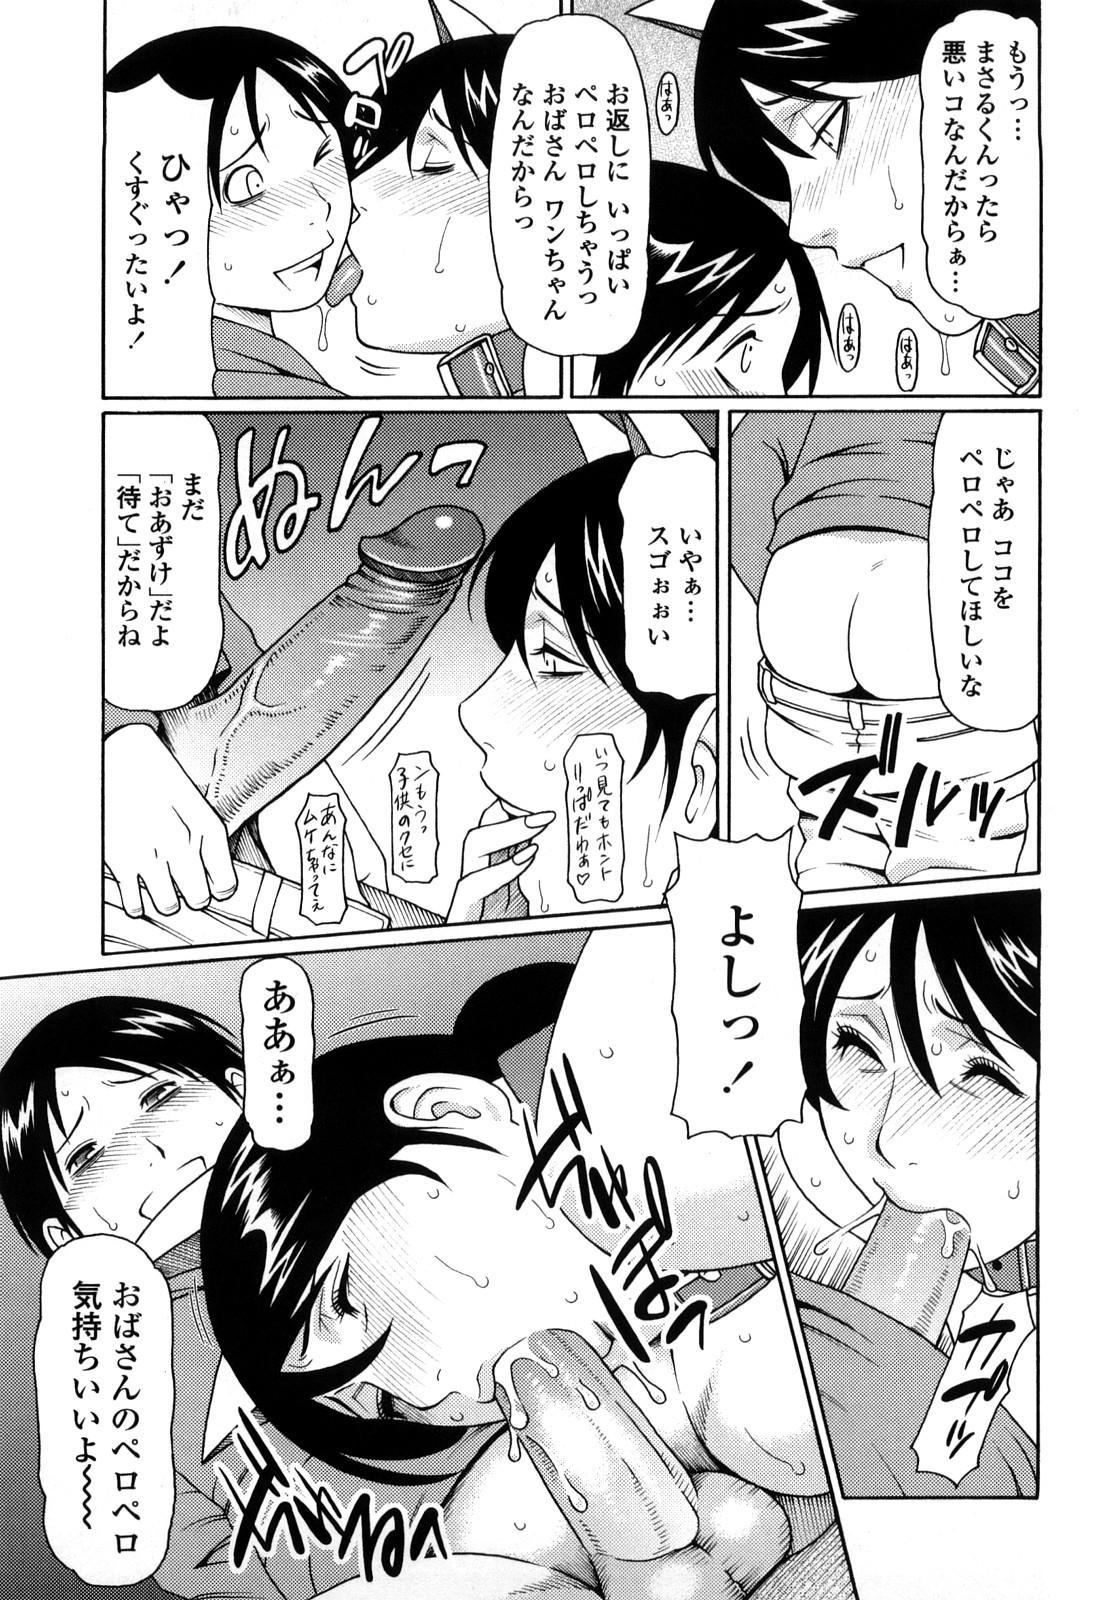 [Takasugi Kou] Kindan no Haha-Ana - Immorality Love-Hole [Decensored] 66